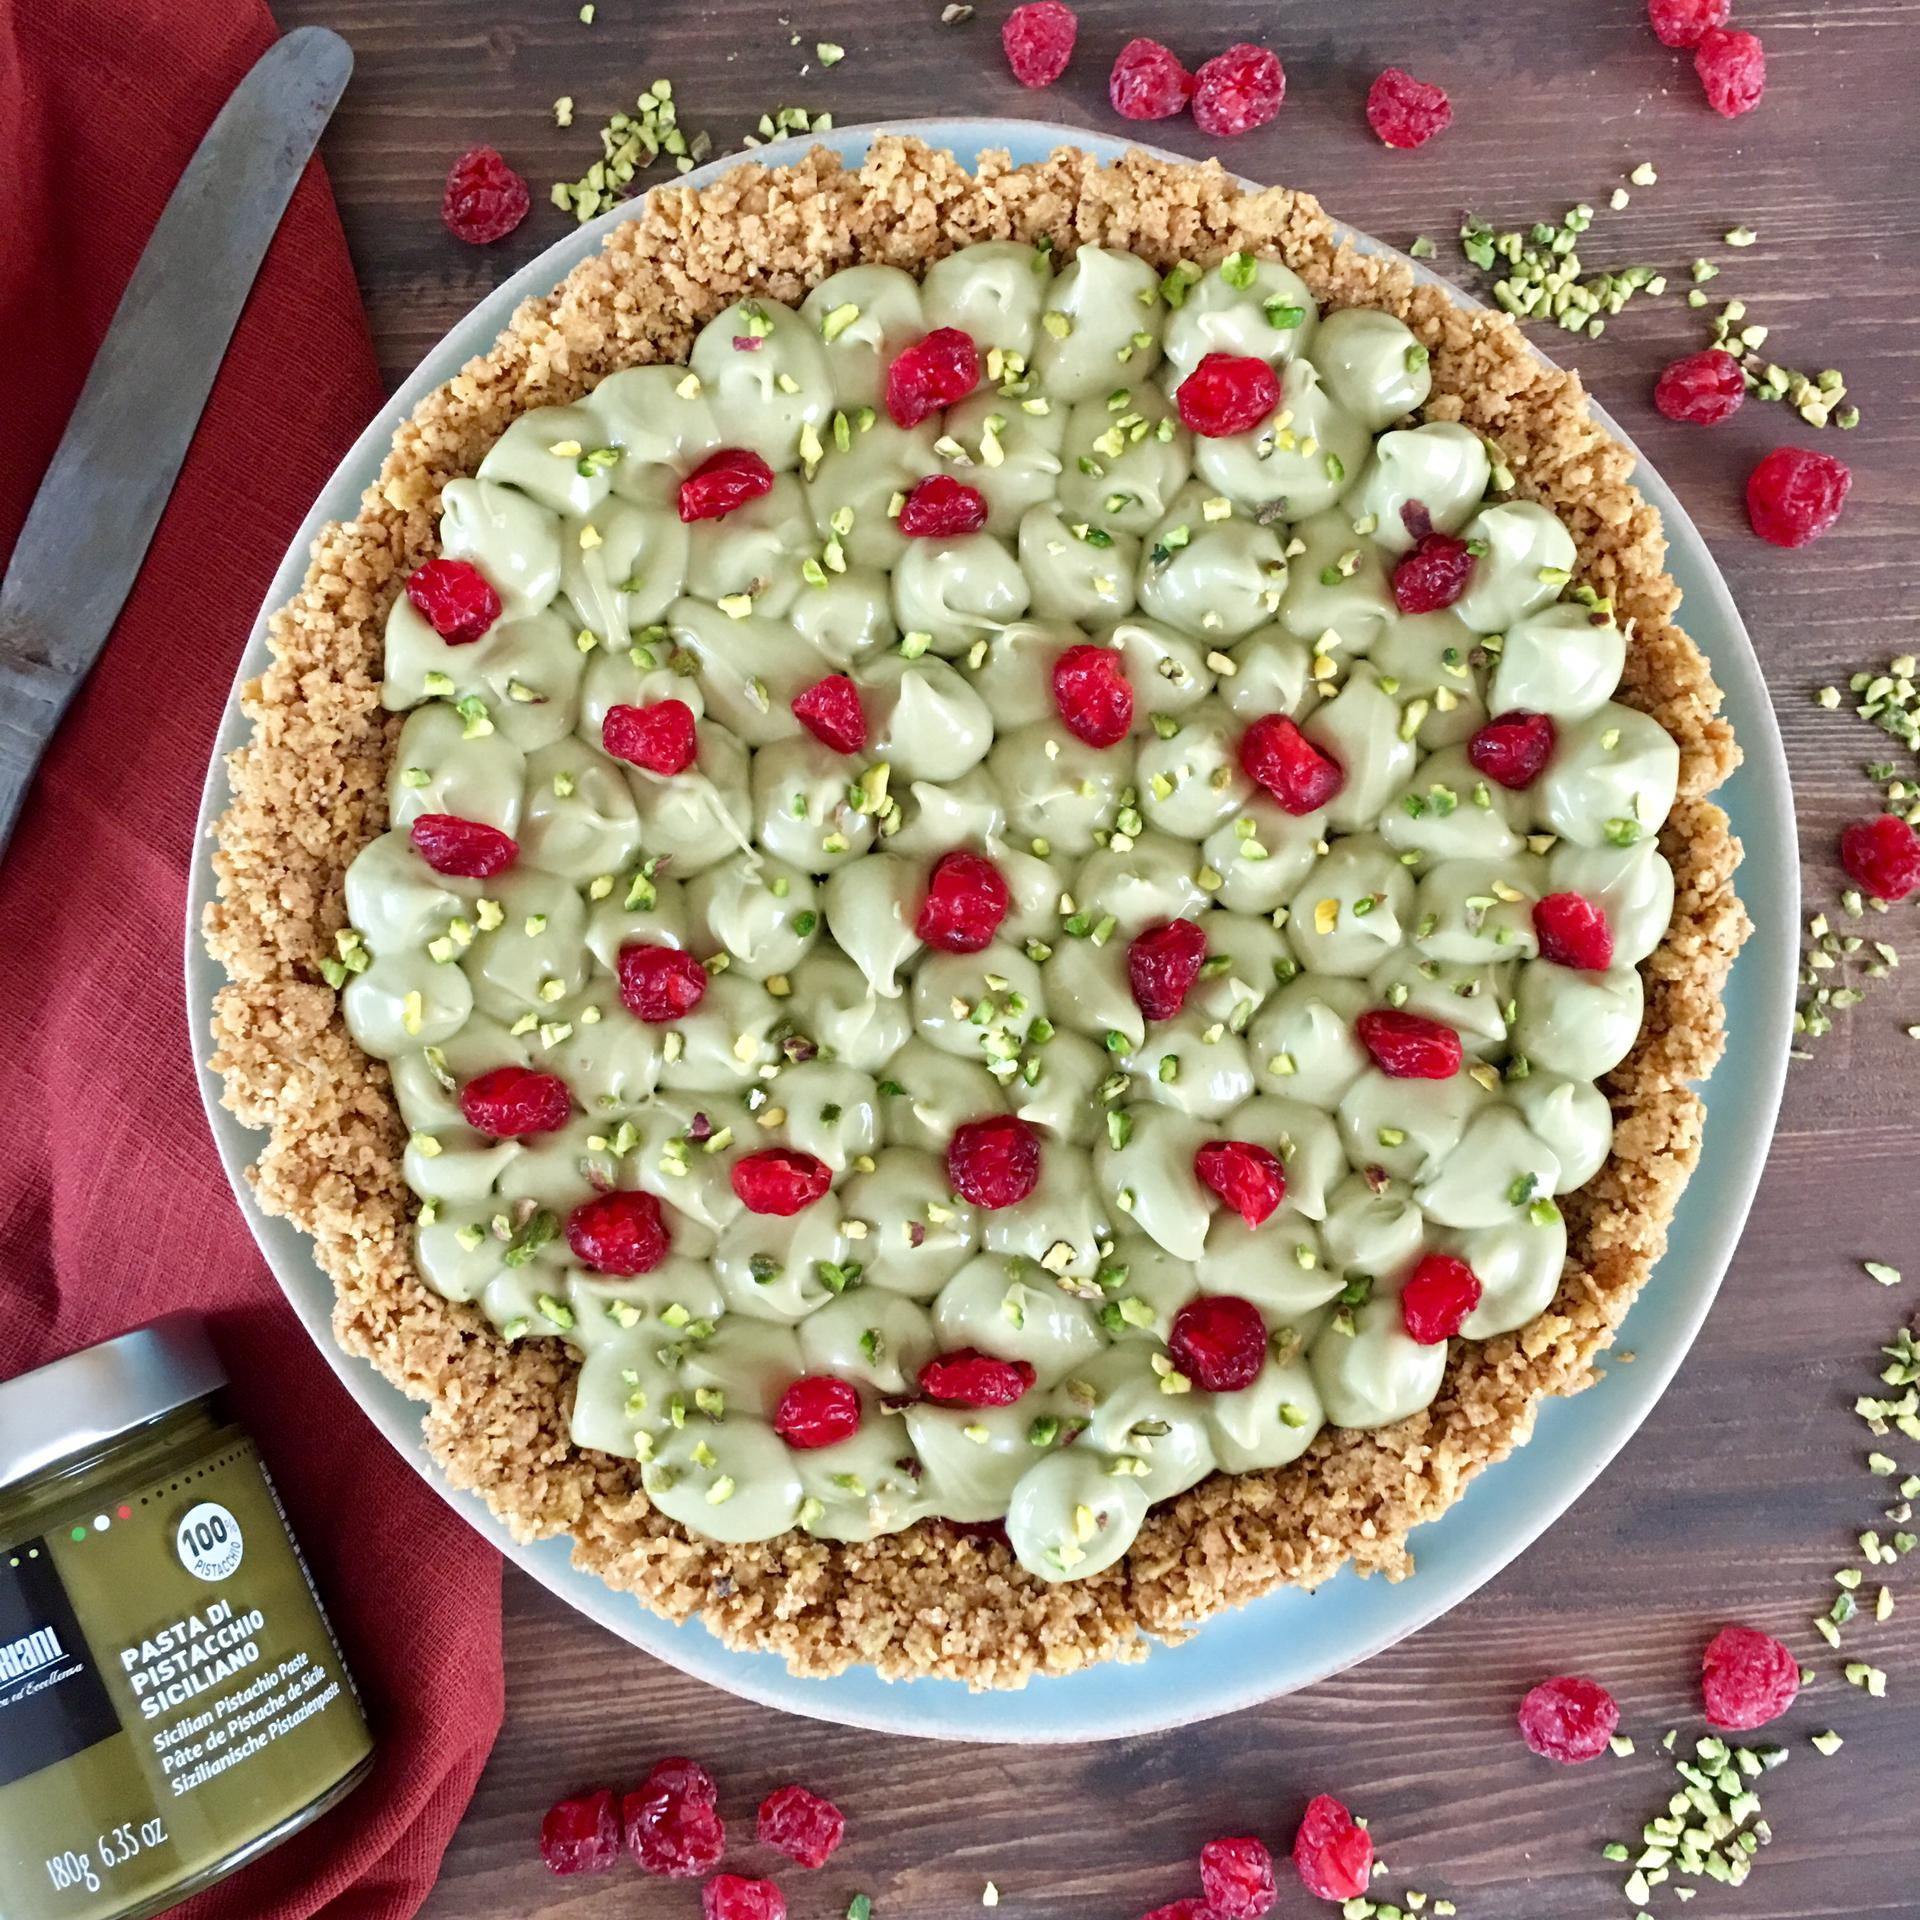 CORNFLAKES-CAKE ALLA NAMELAKA DI PISTACCHIO E LAMPONI